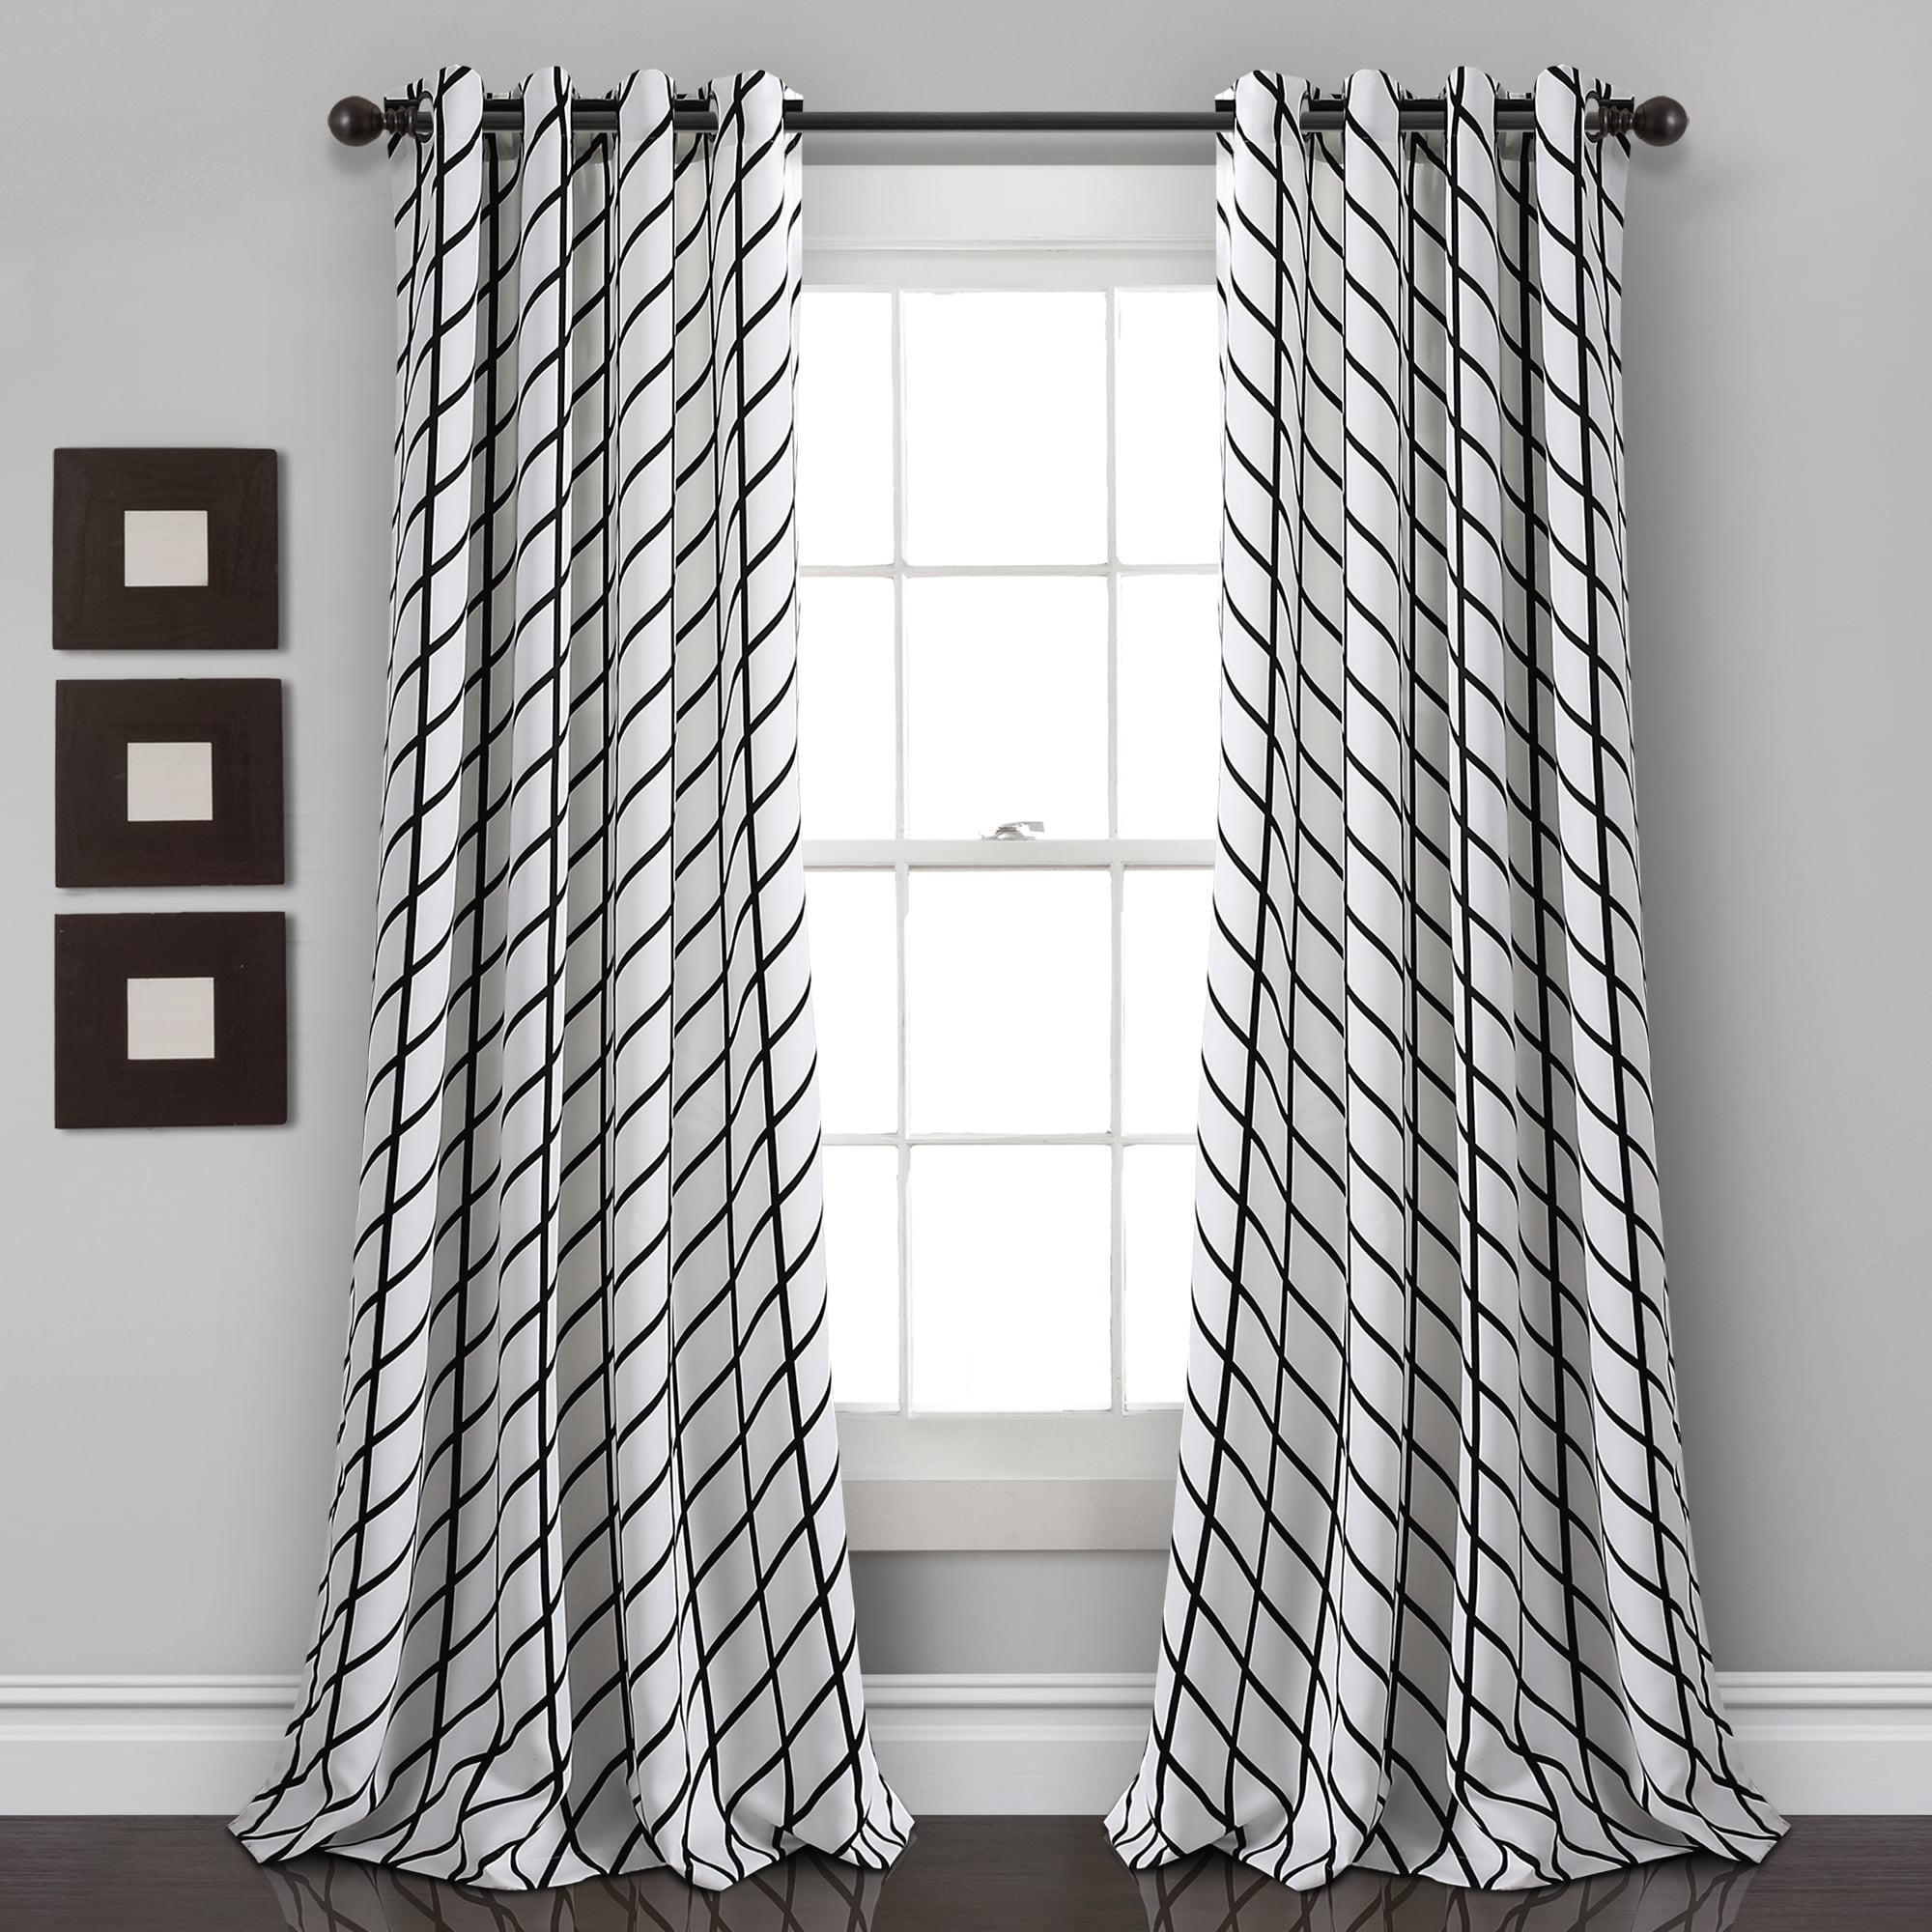 Feather Arrow Geo Room Darkening Window Curtain Panels White/Black Set 52X84